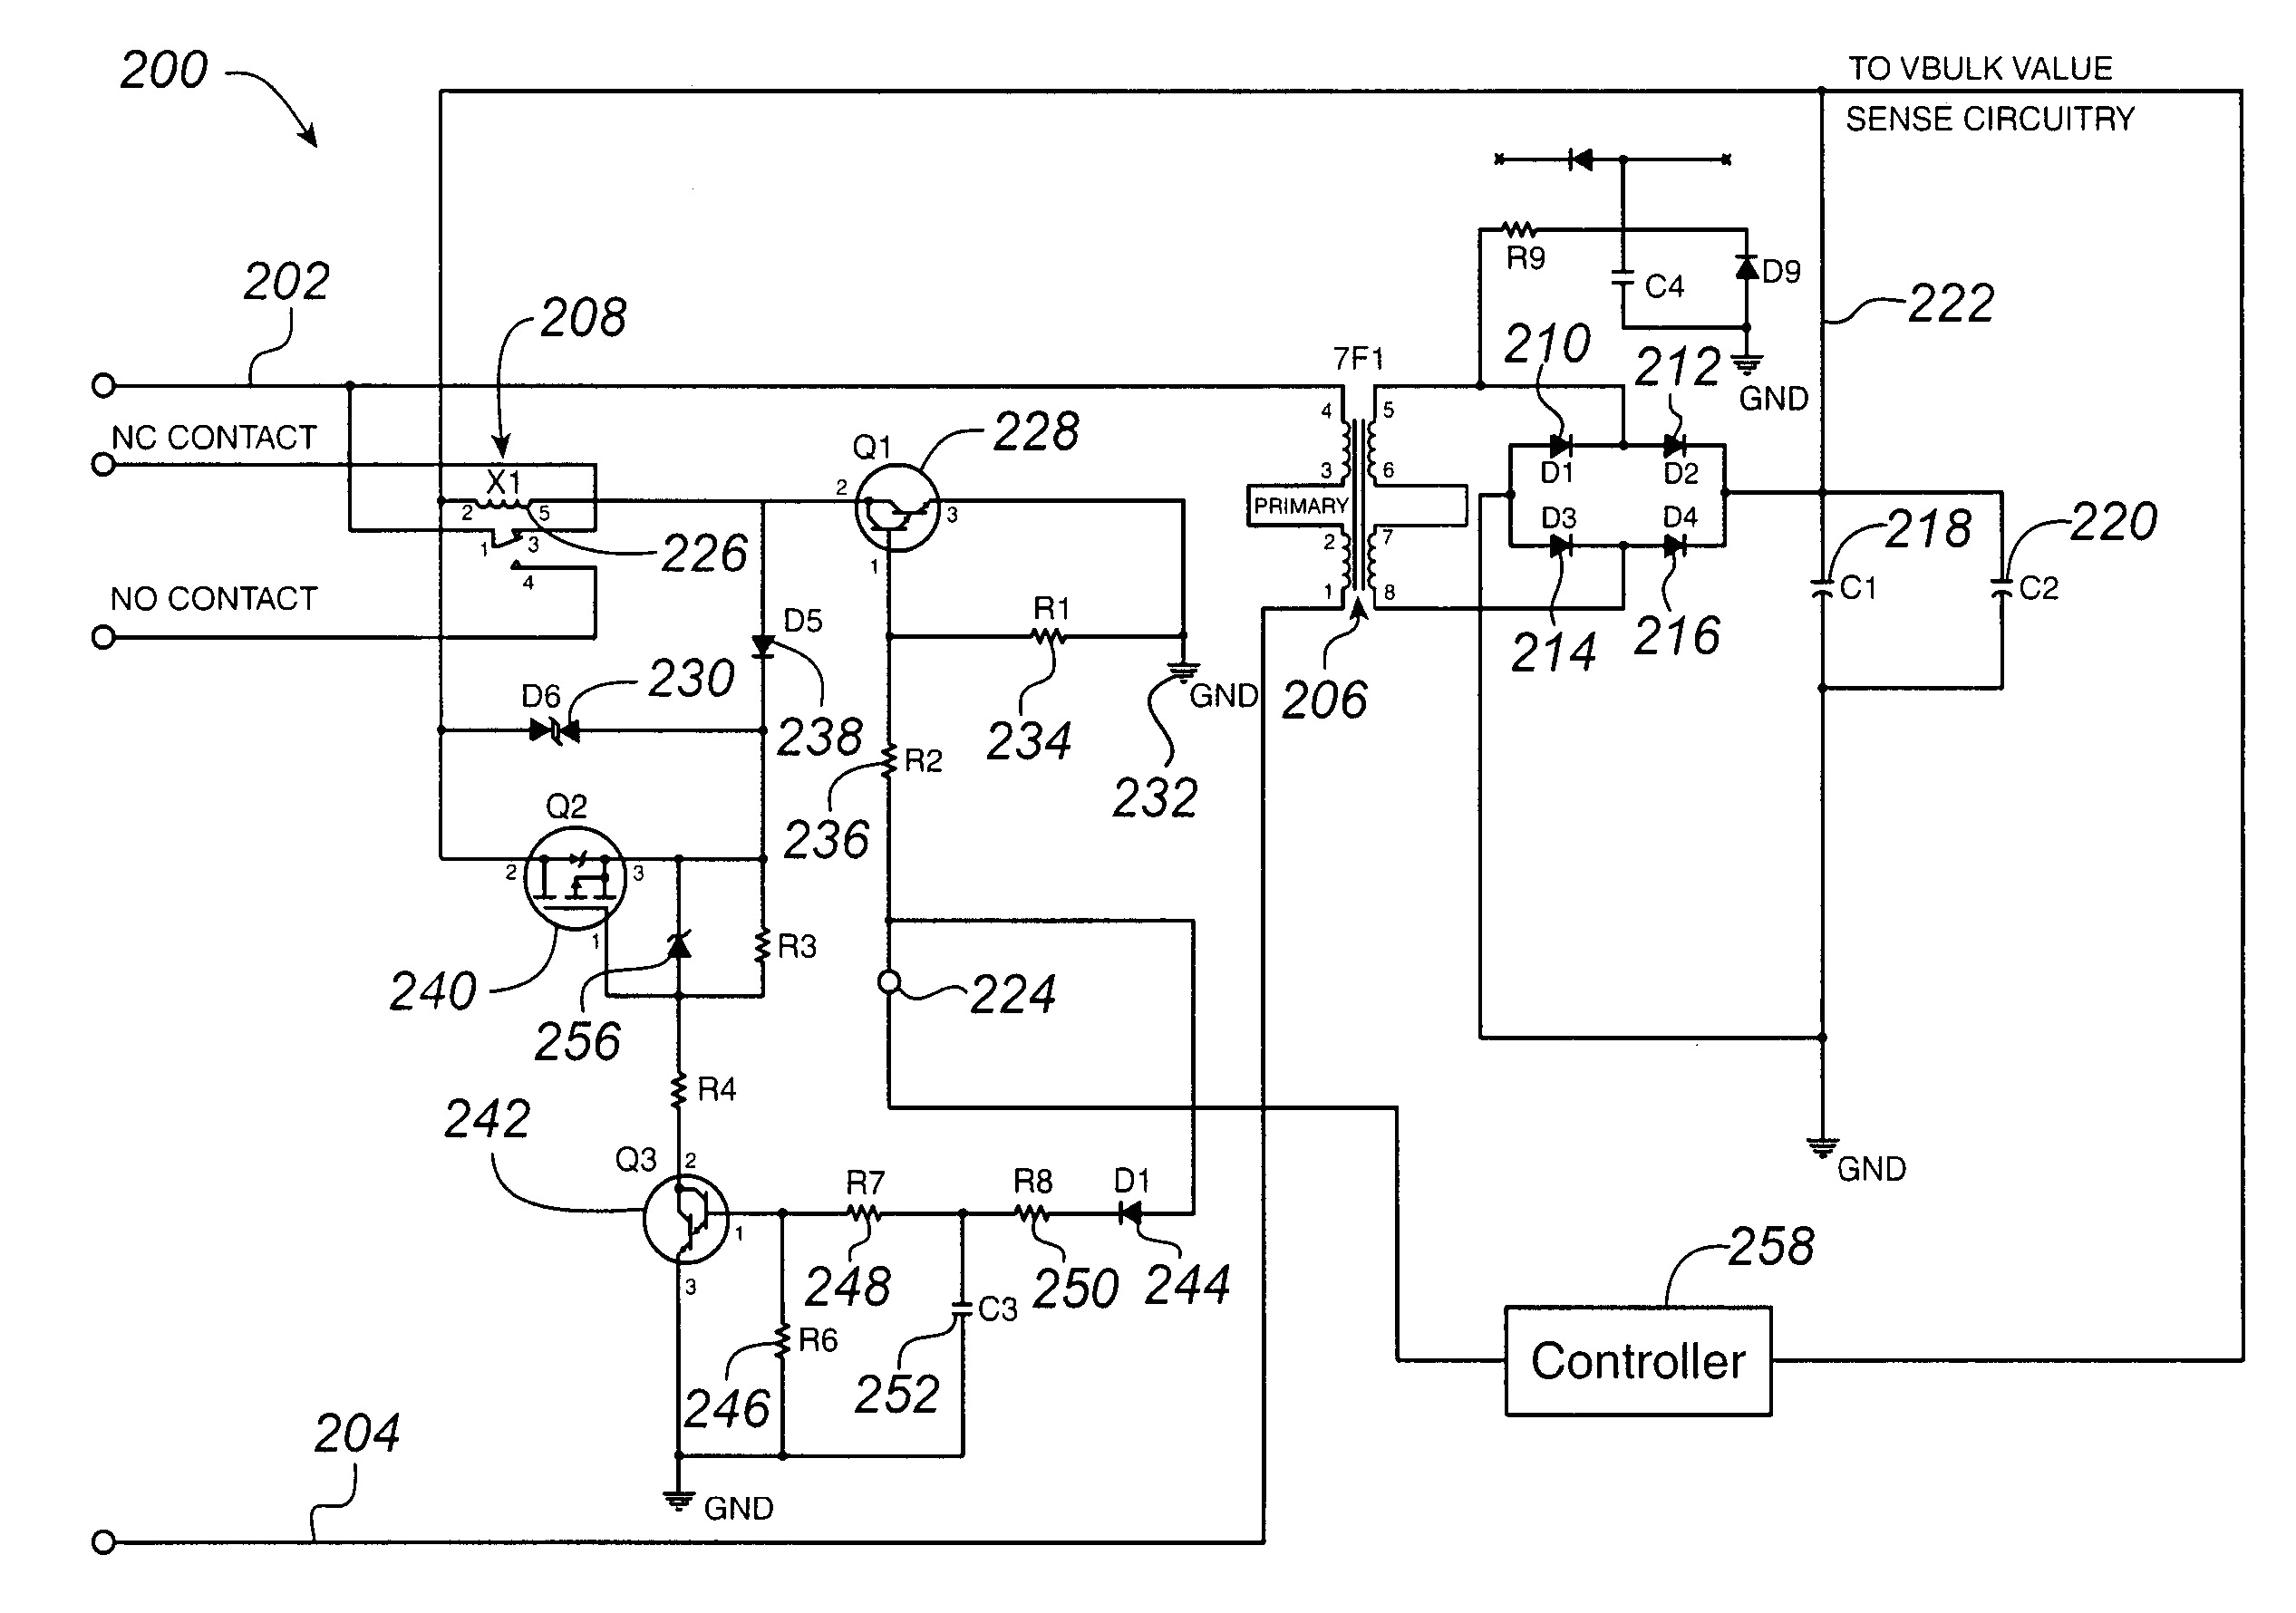 model cooler in diagram walk wiring bht030h2b wiring diagram mega heatcraft walk in cooler wiring diagram